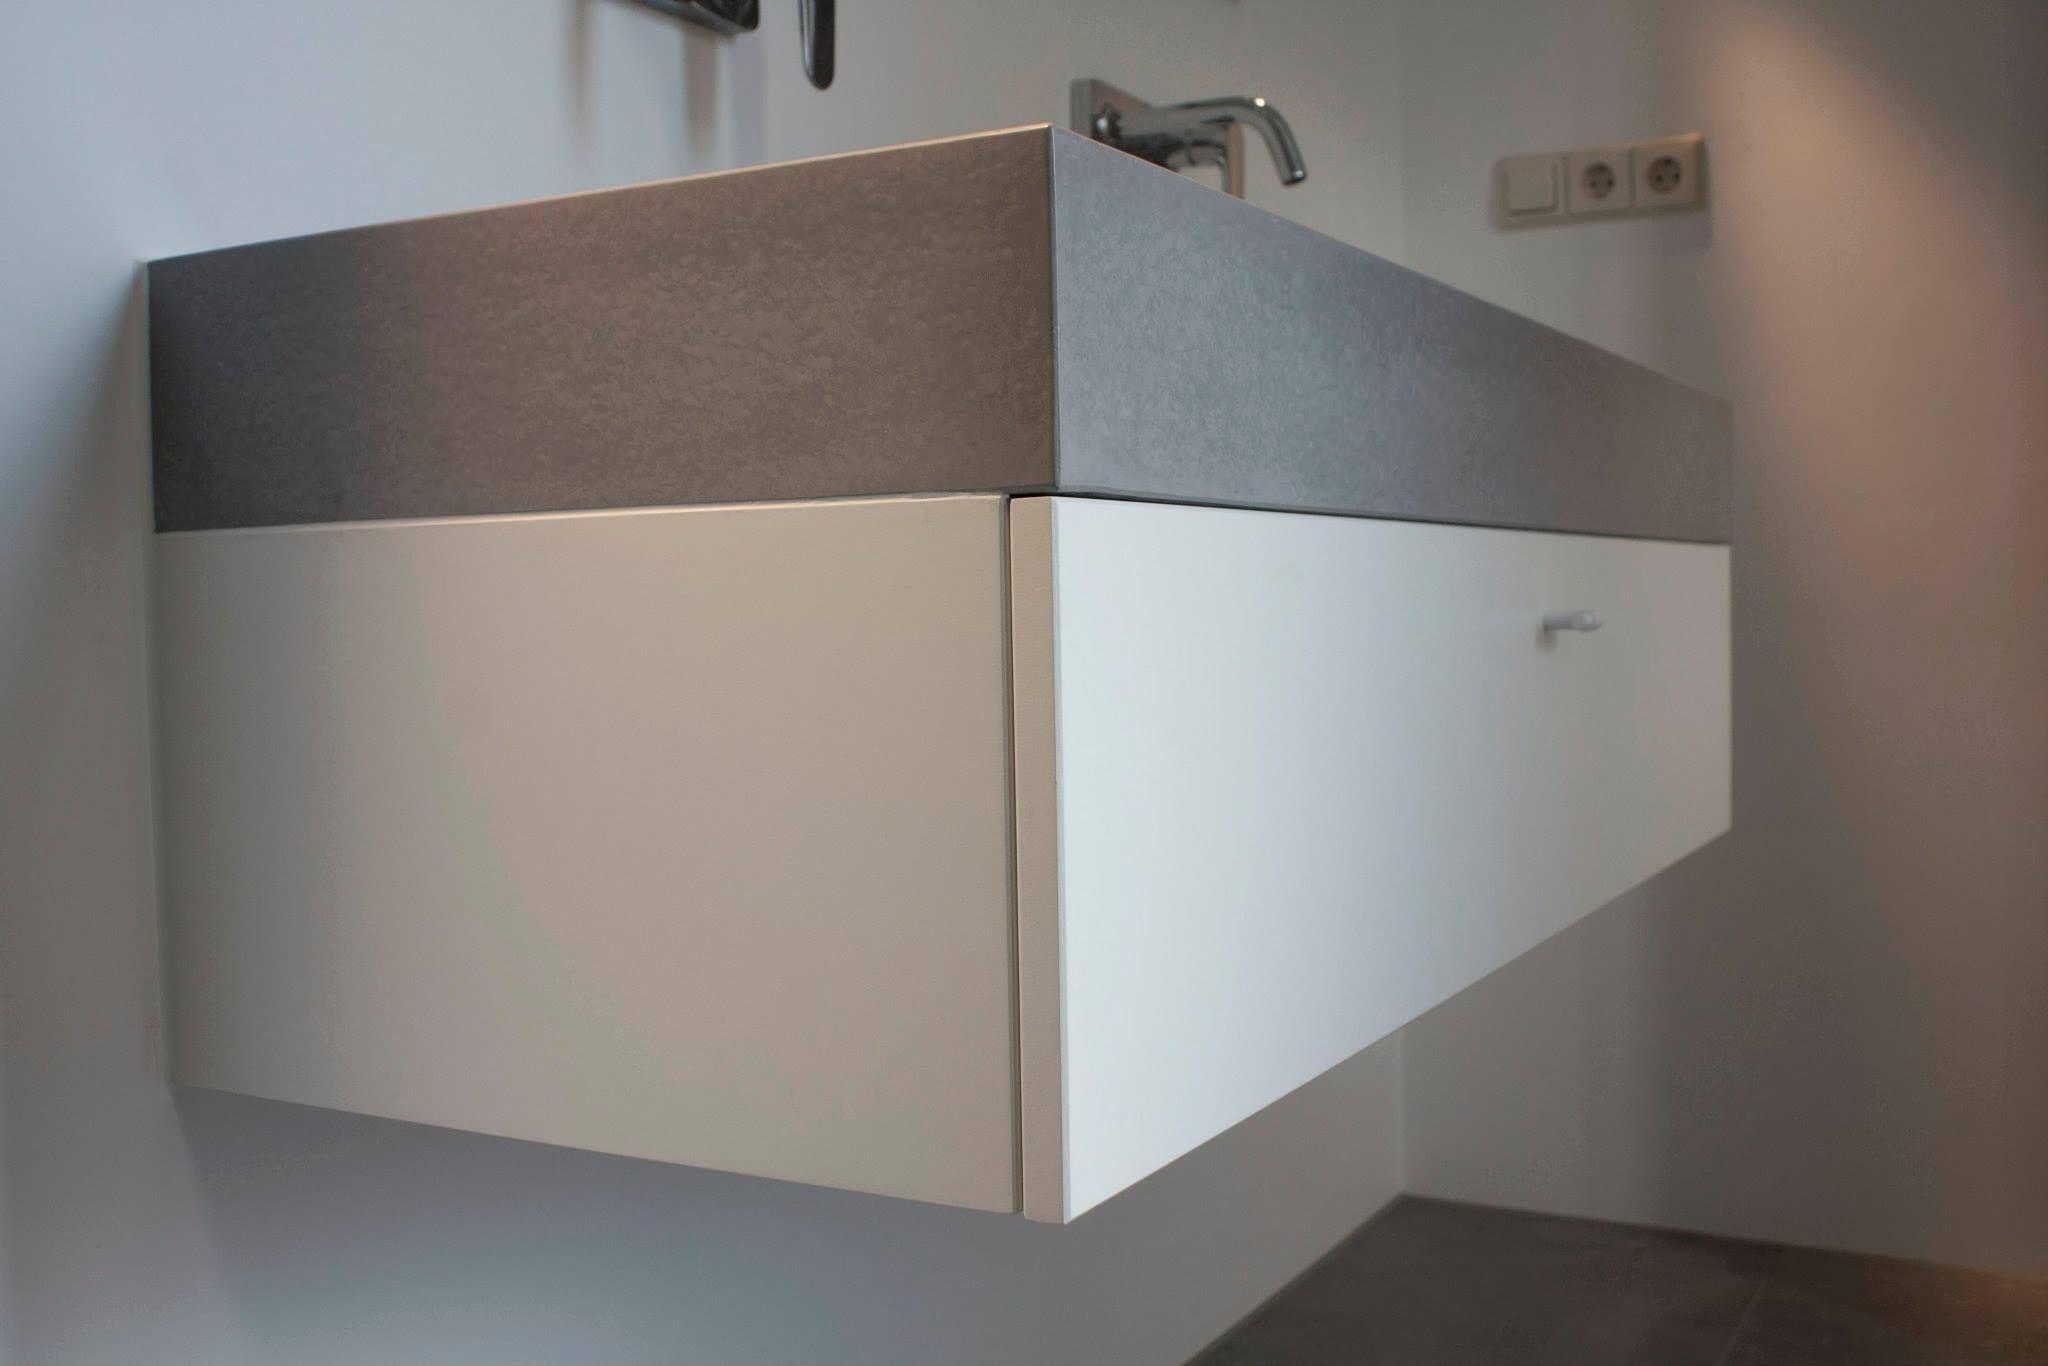 Badkamer Kast Handdoeken : Badkamerkast laten maken oud dressoir opknappen voor badkamer